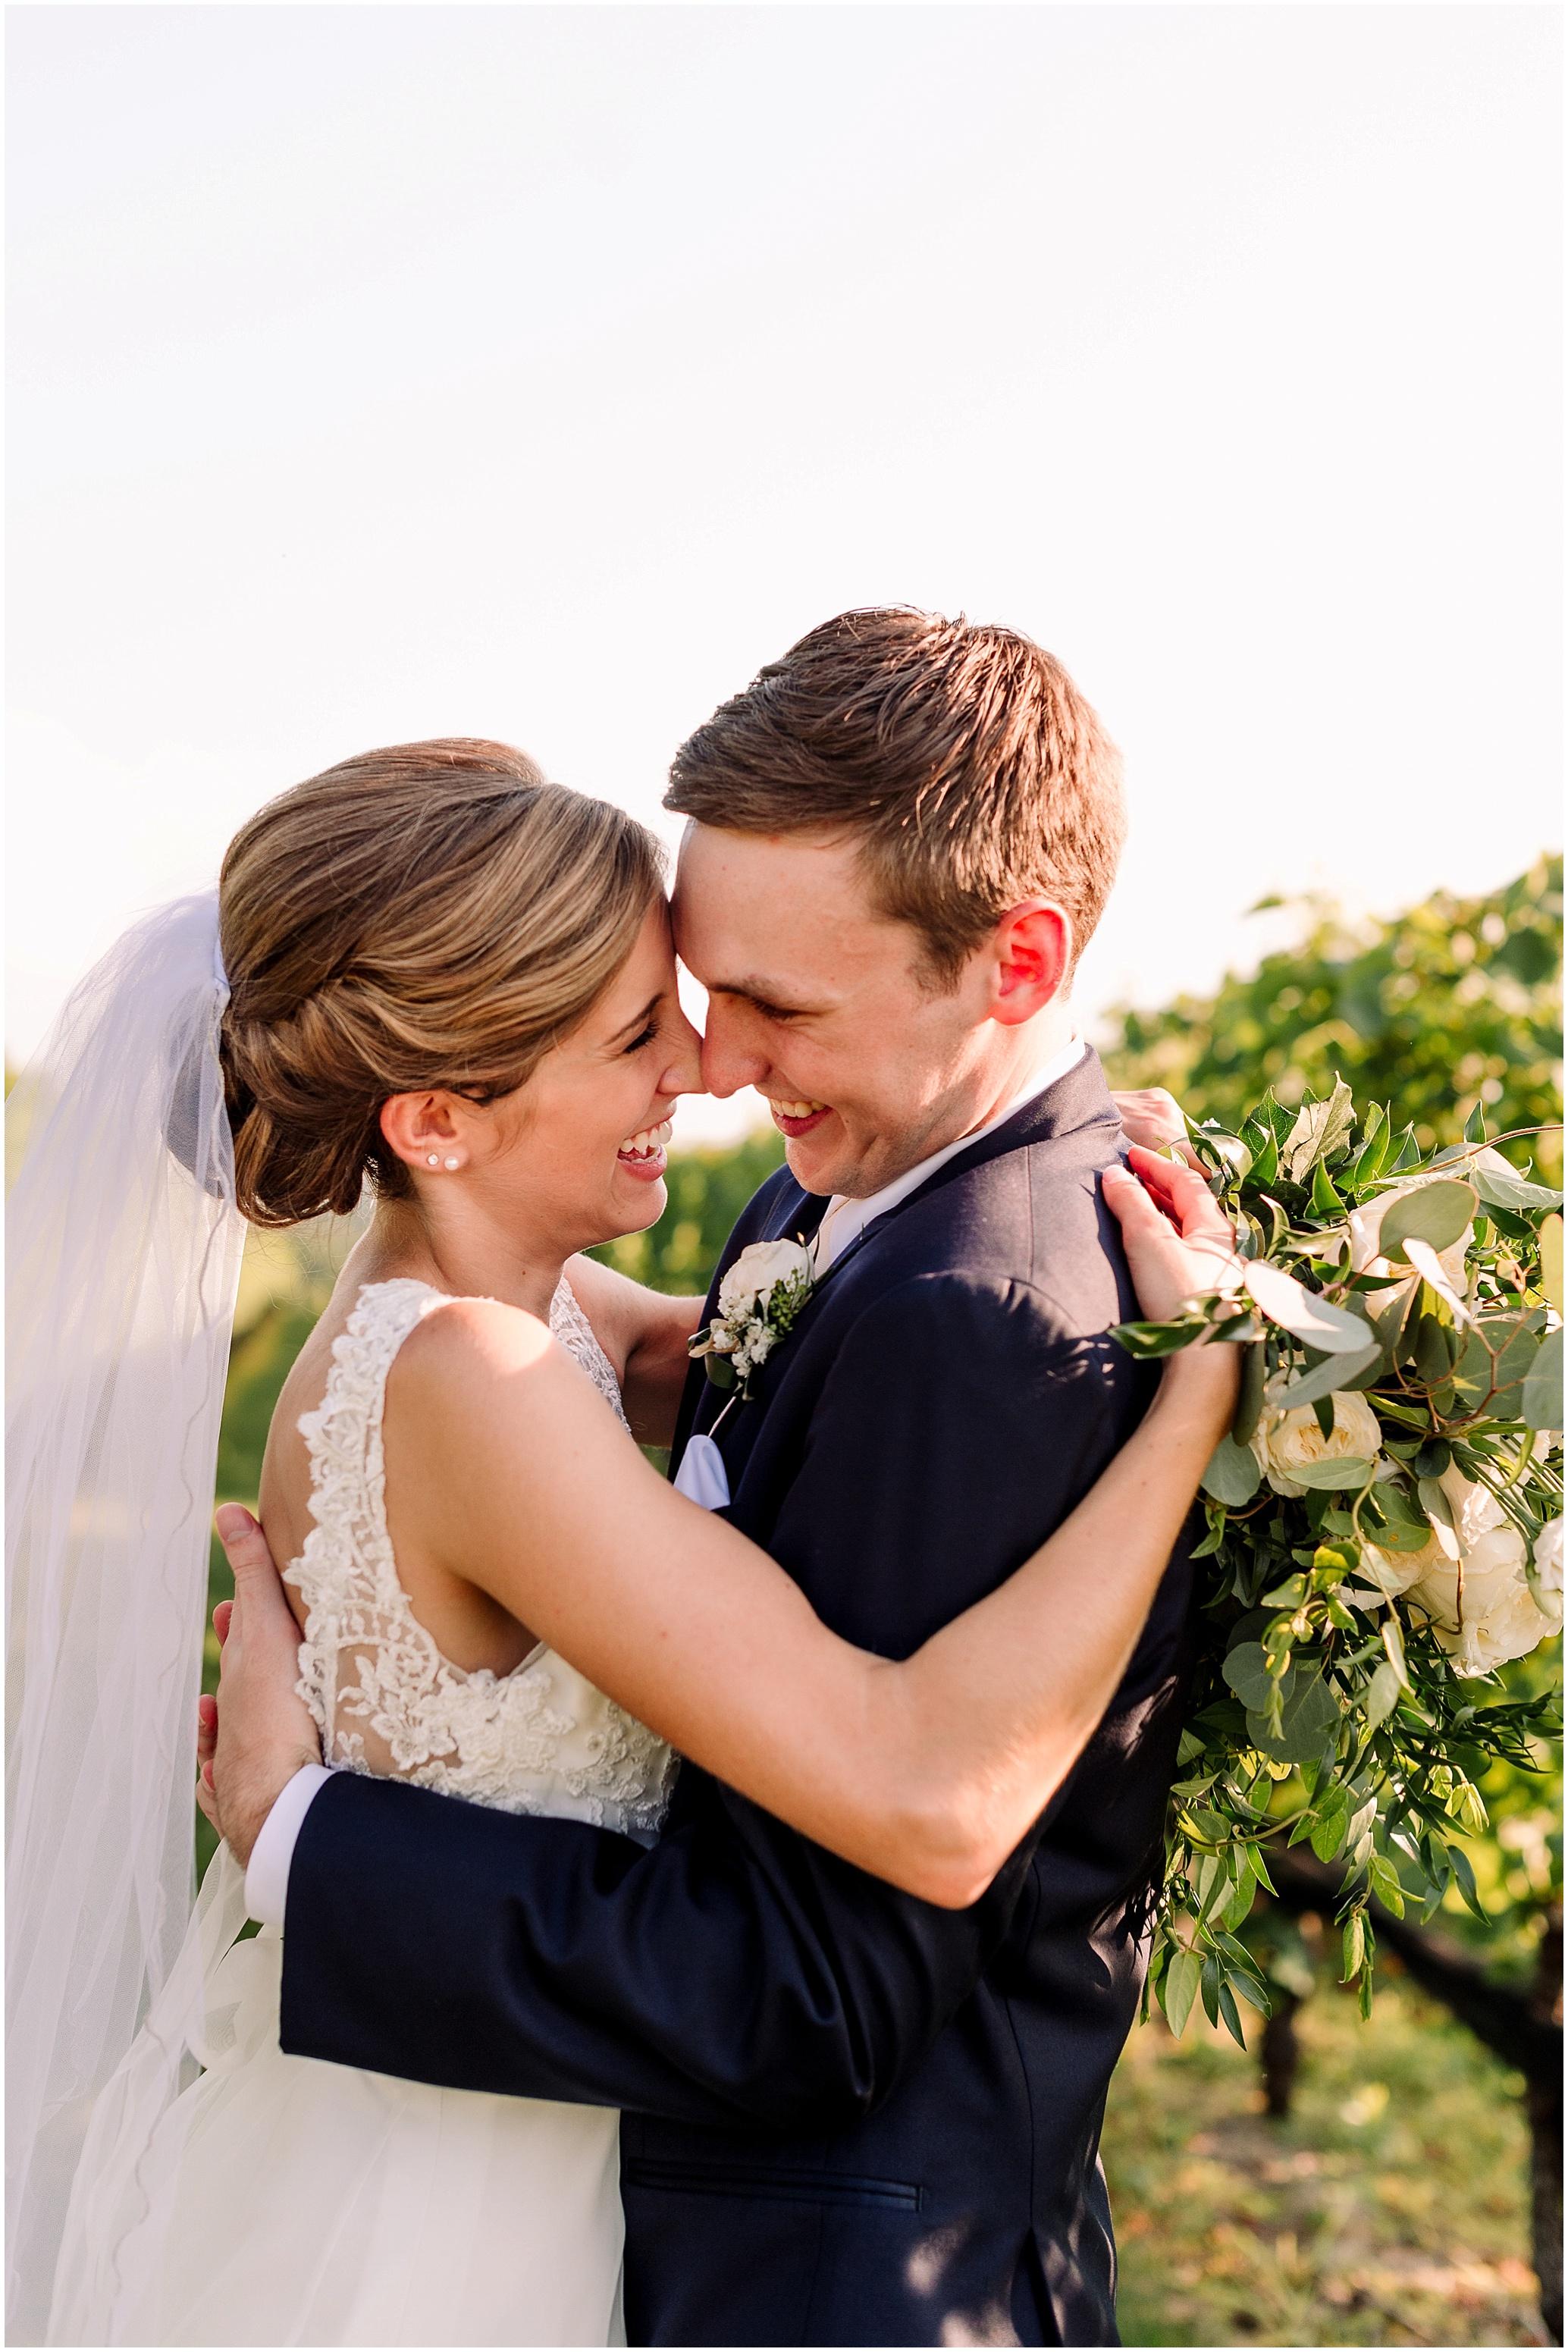 Hannah Leigh Photography Stone Tower Winery Wedding Leesburg VA_4781.jpg